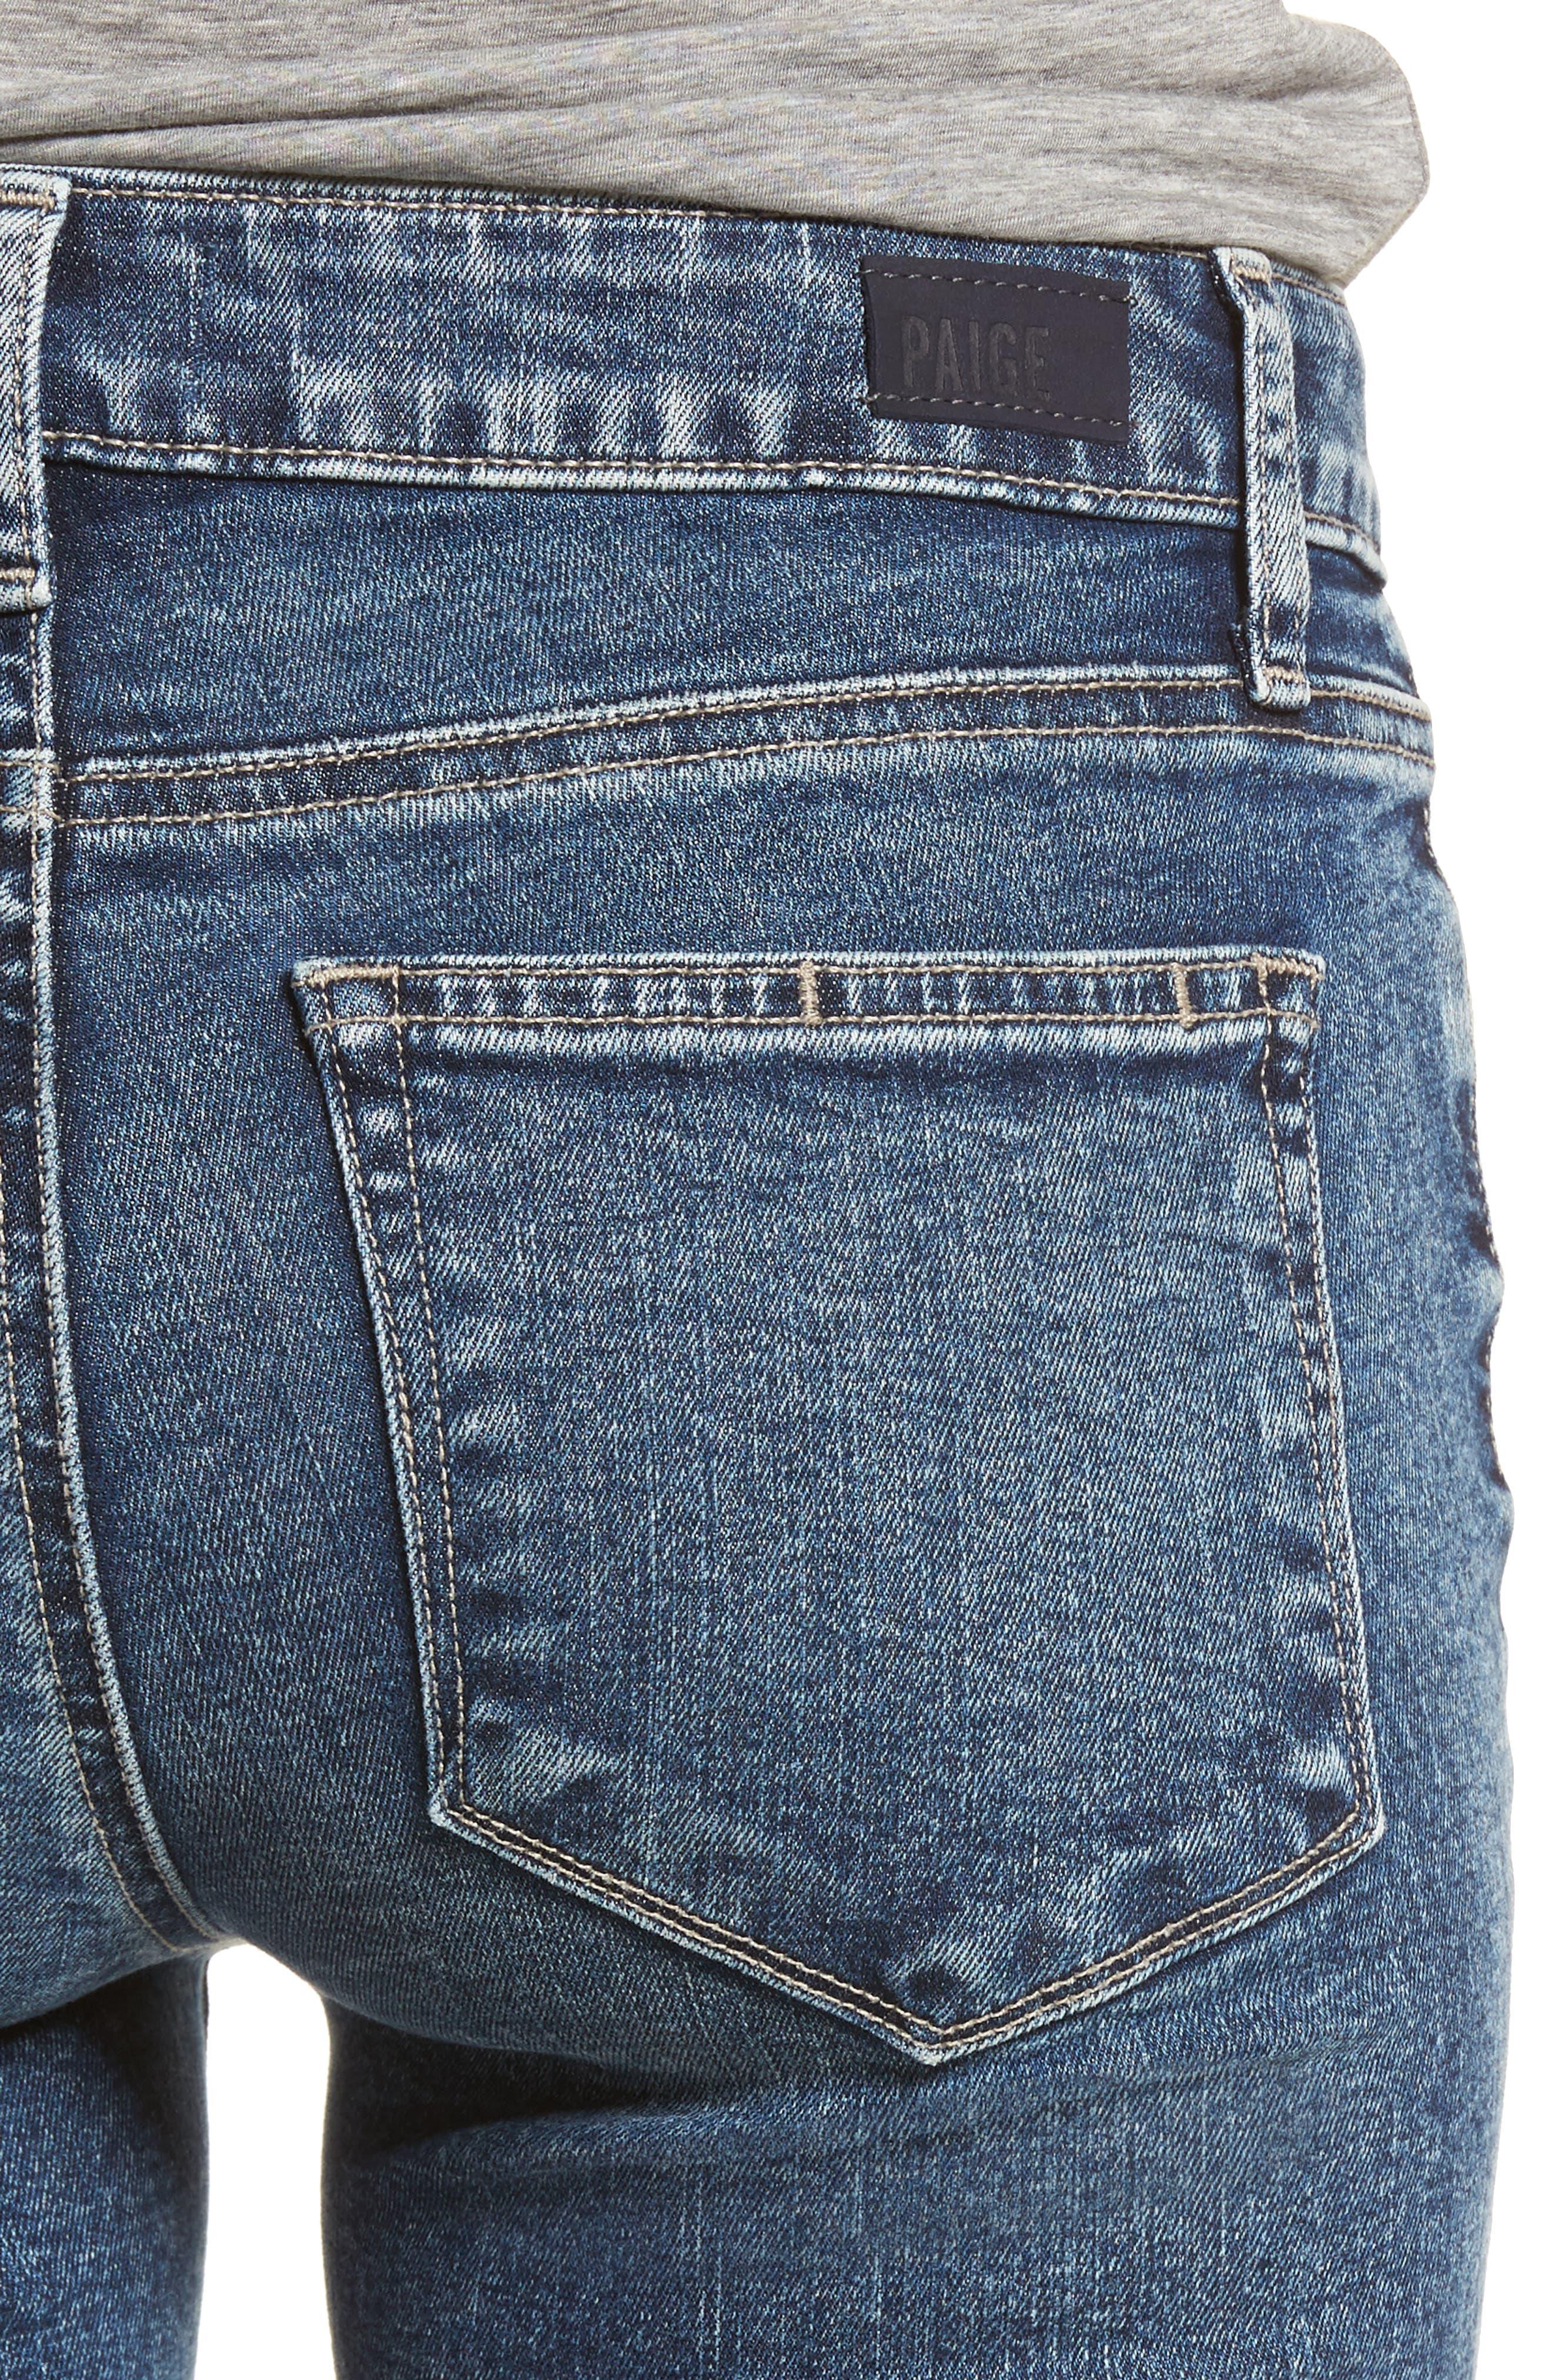 Transcend Vintage - Verdugo Ultra Skinny Jeans,                             Alternate thumbnail 4, color,                             Iness